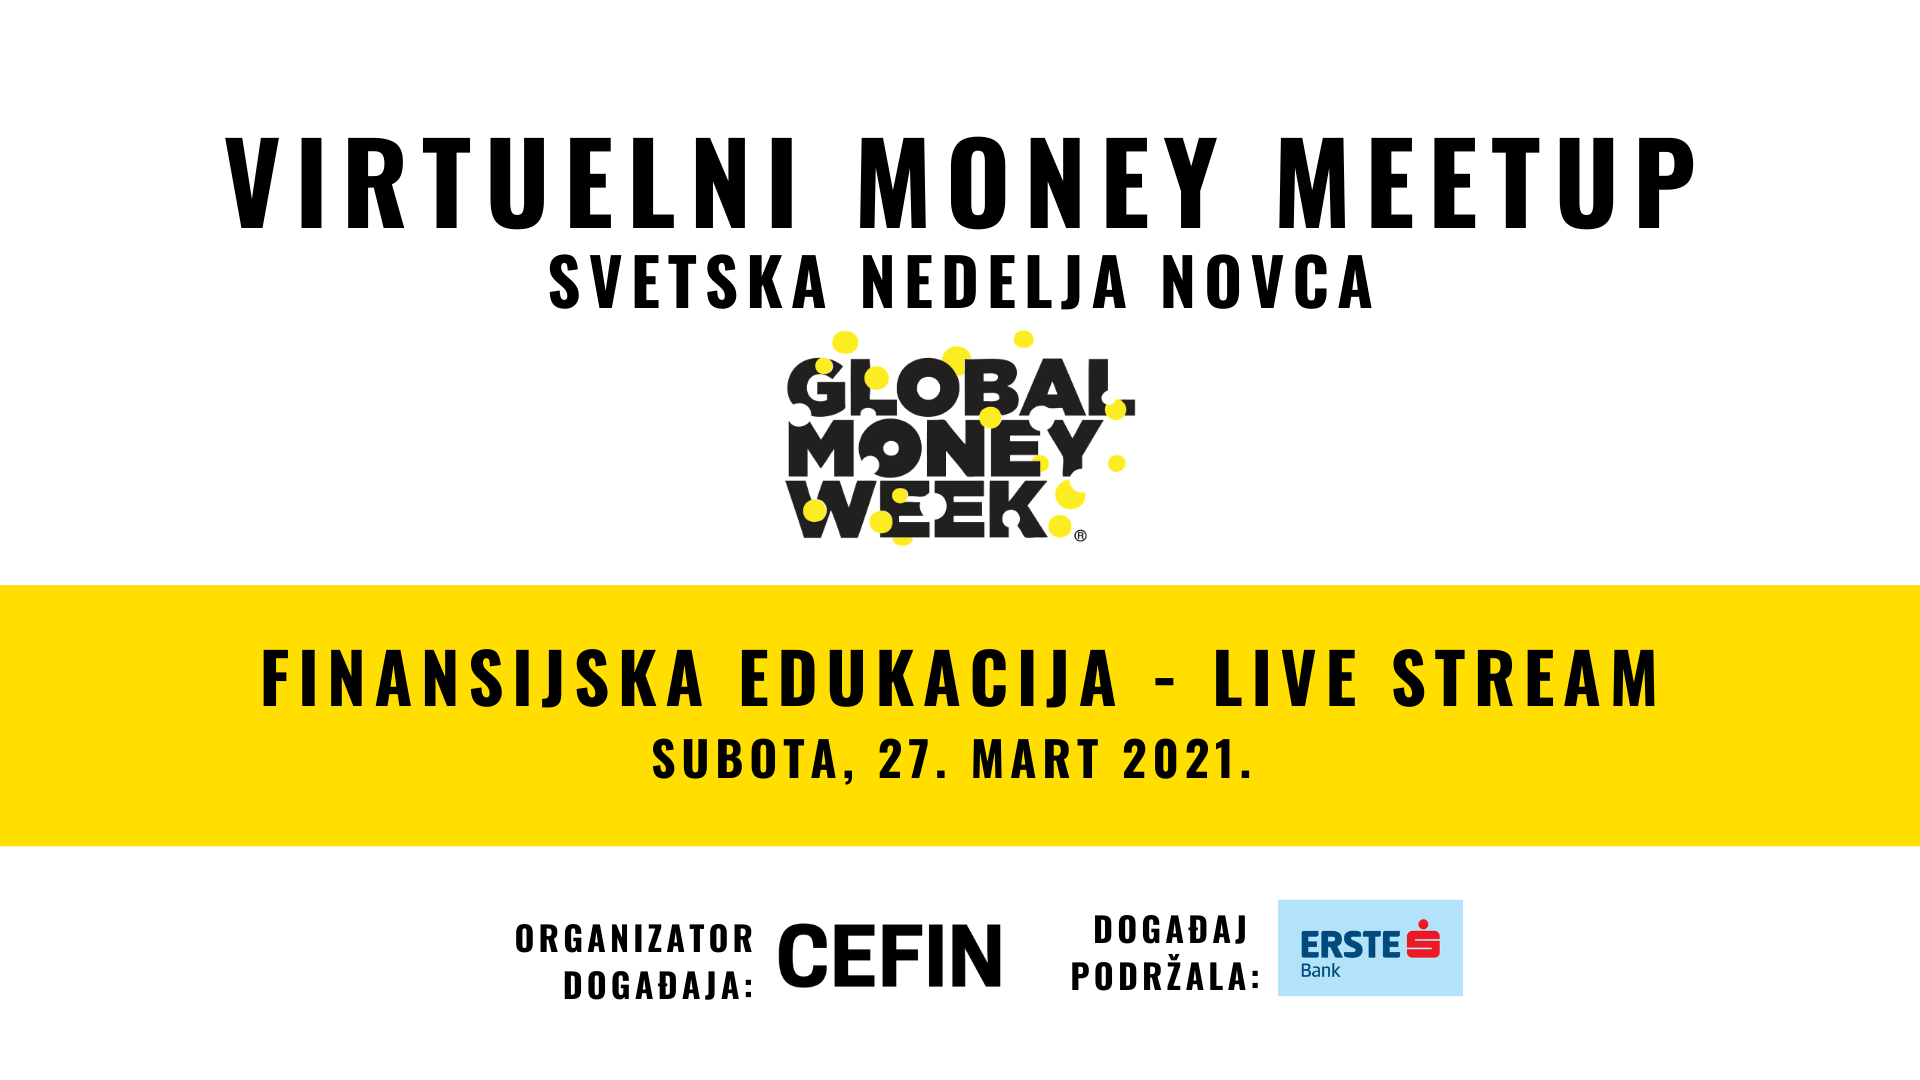 Virtuelni Money Meetup